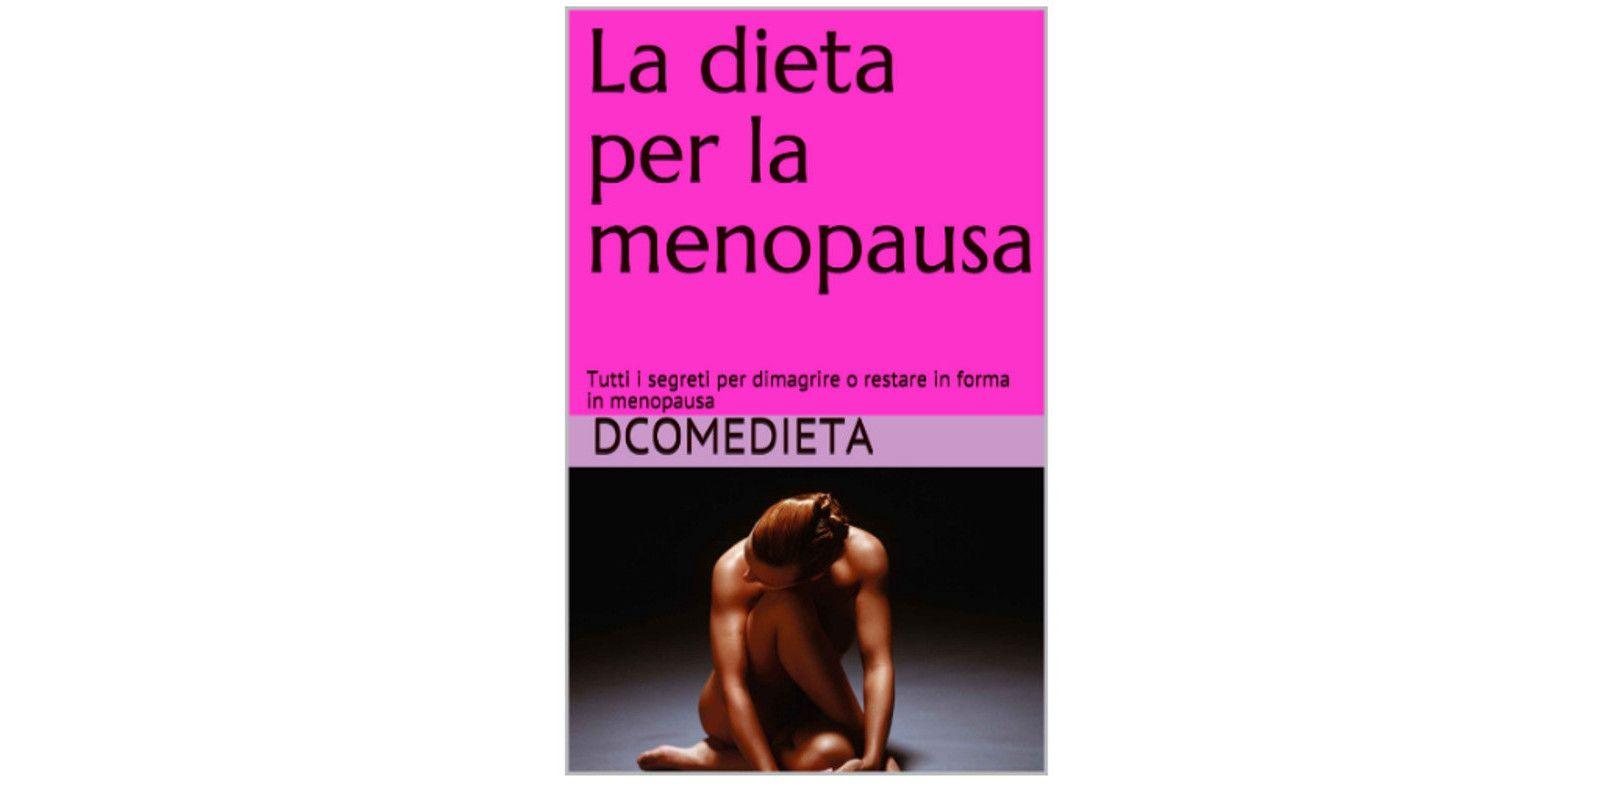 menopausa_dieta-1